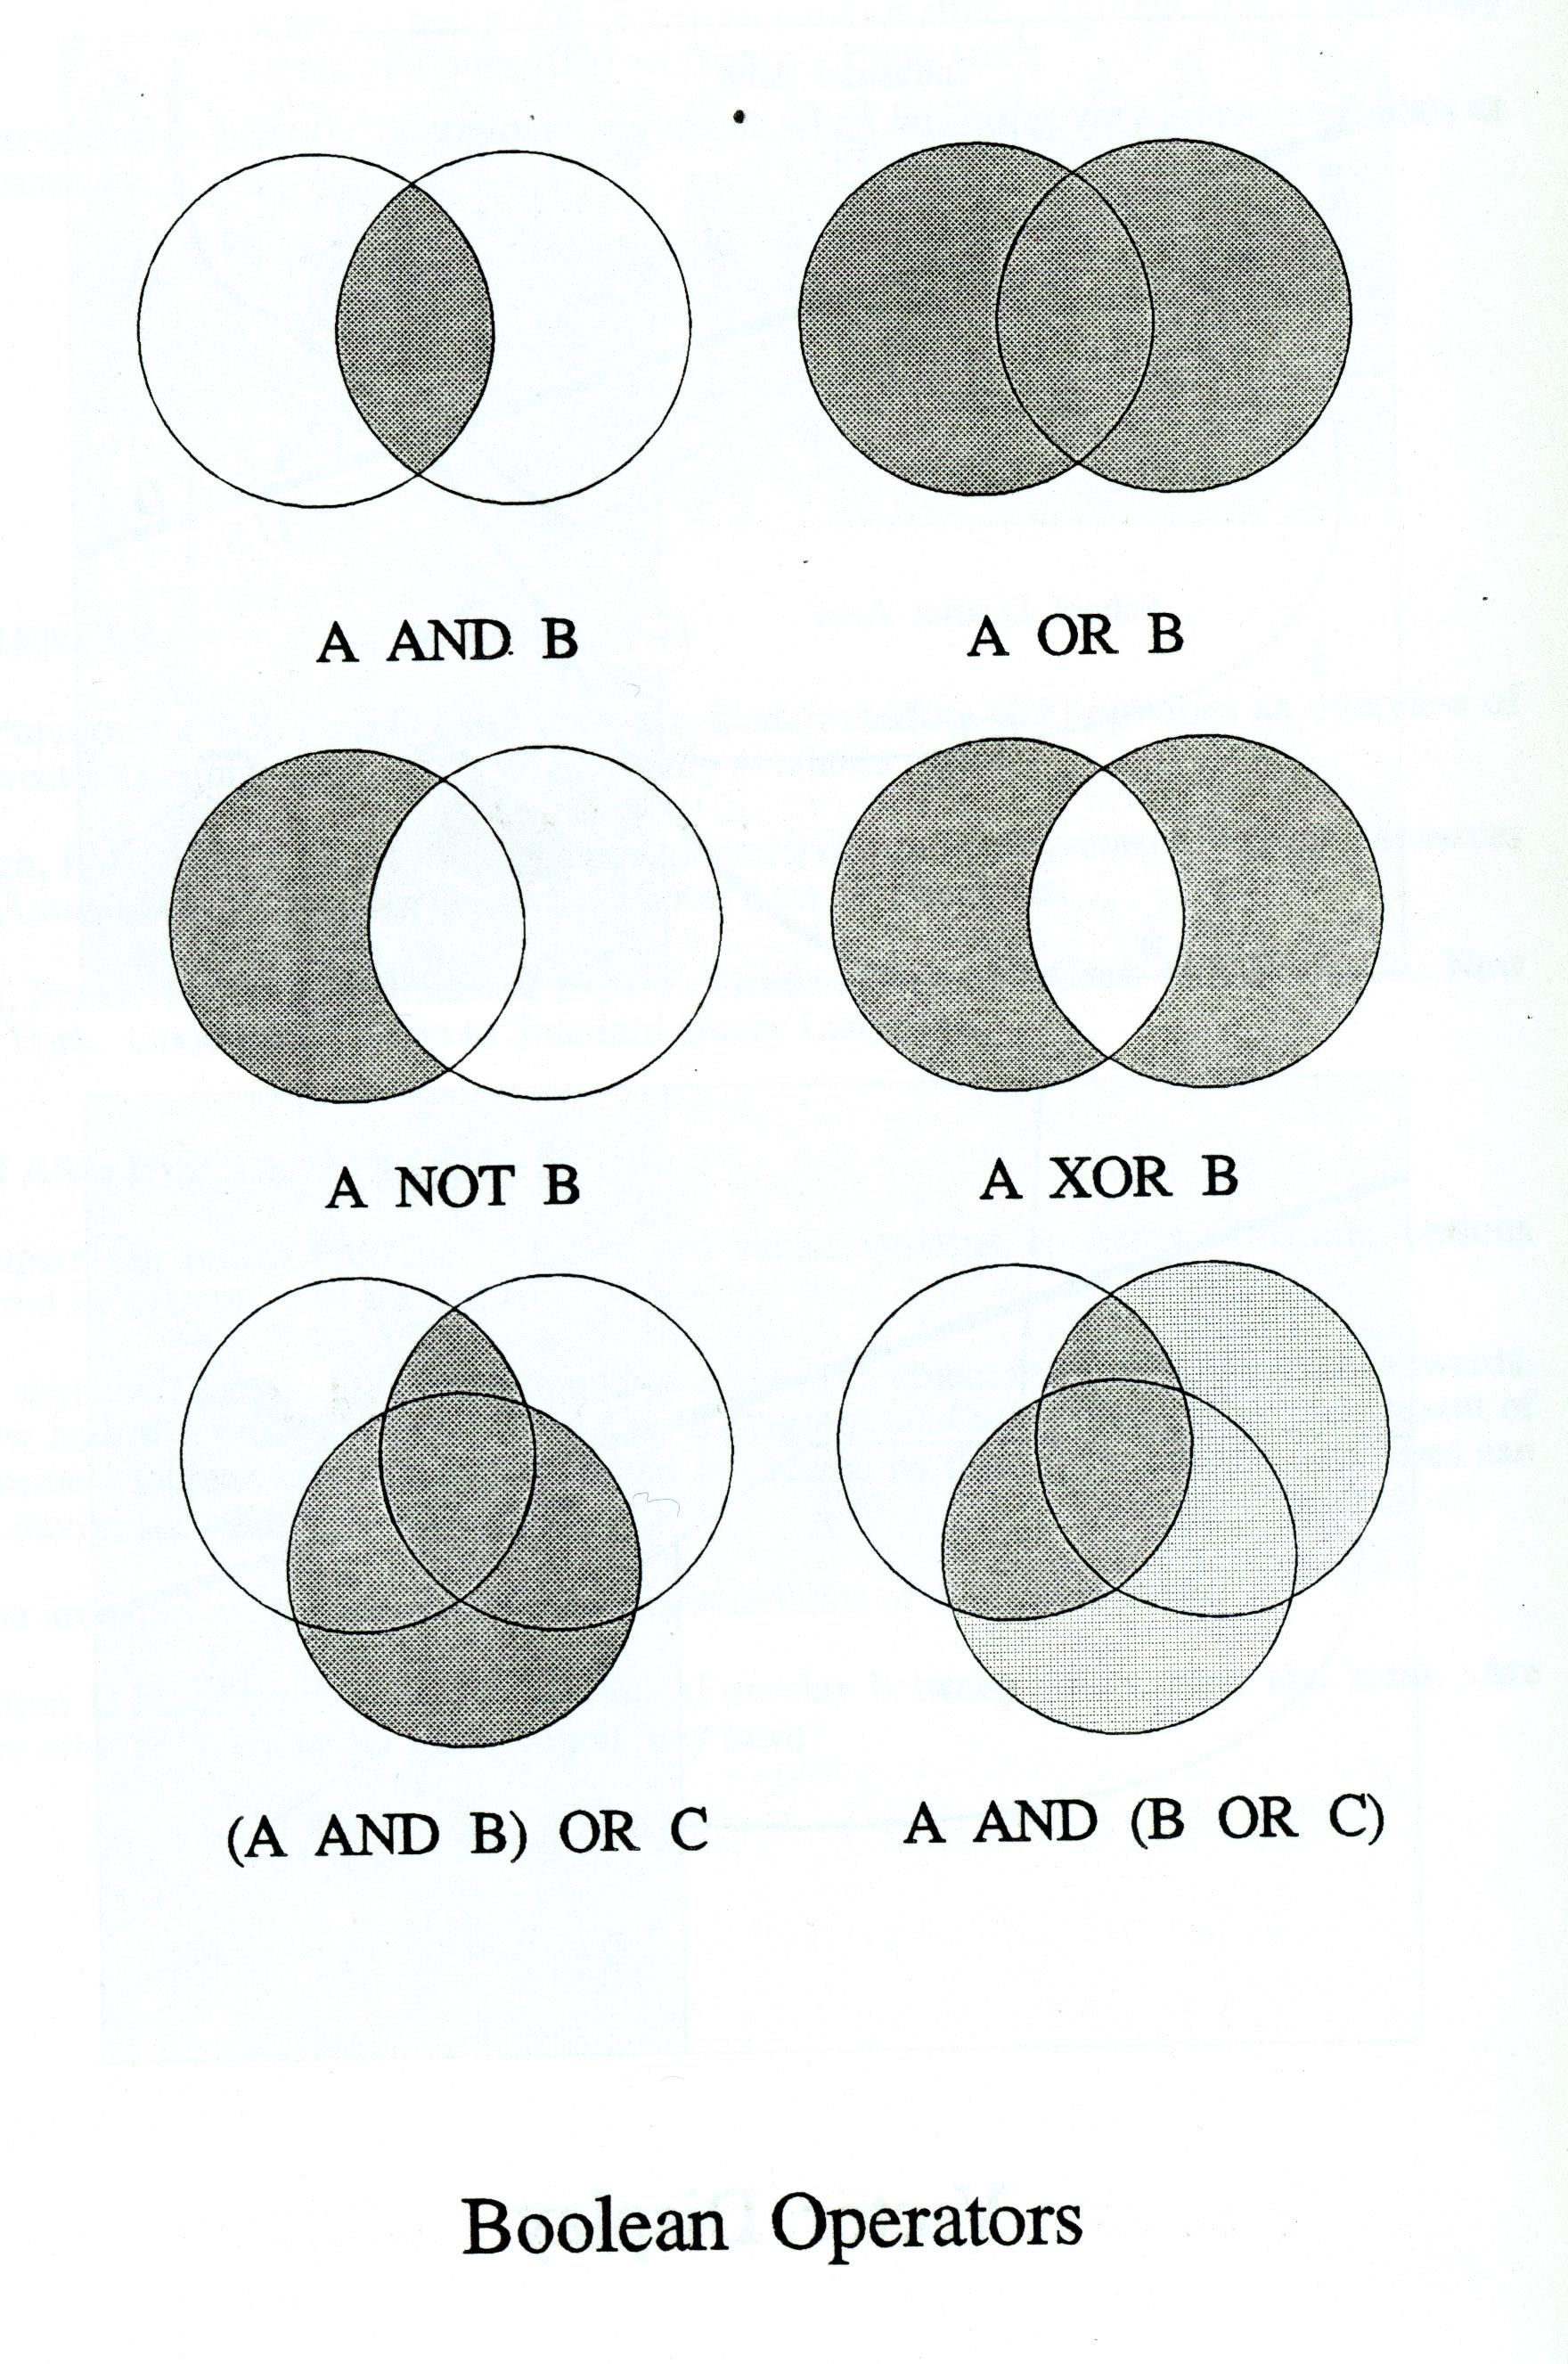 not a or b venn diagram